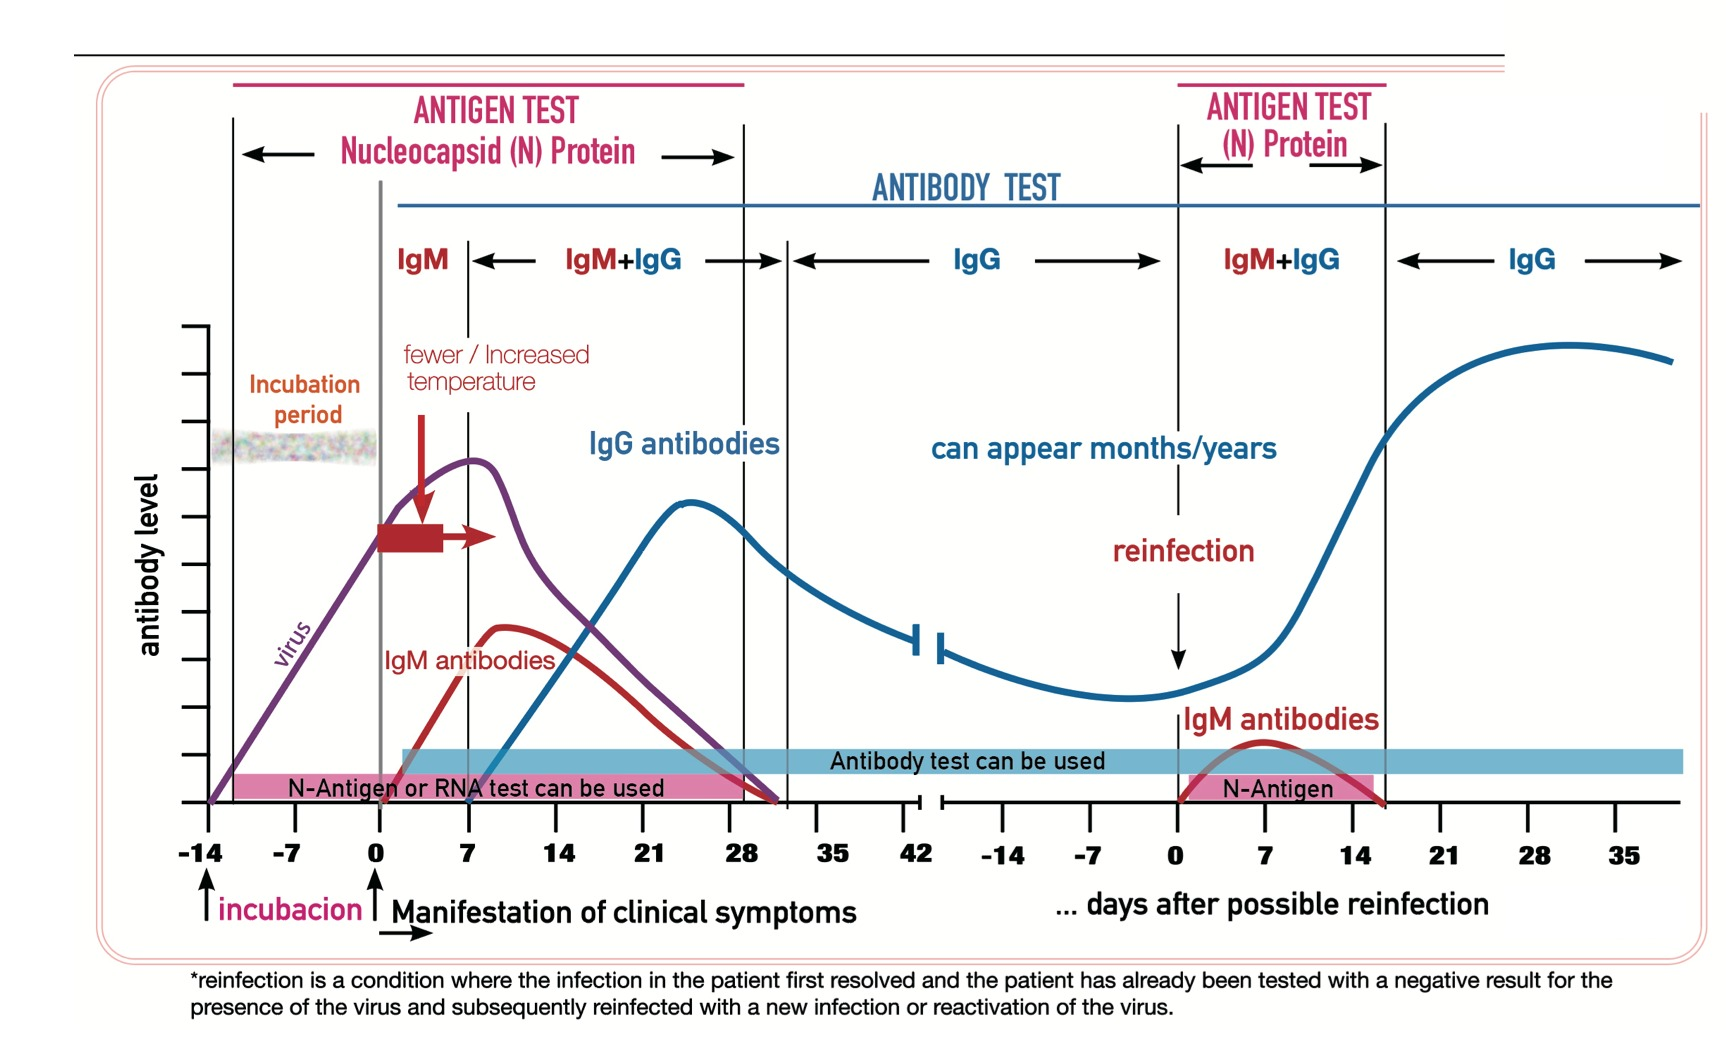 Covid-19 Antigen Rapid Test Medakit